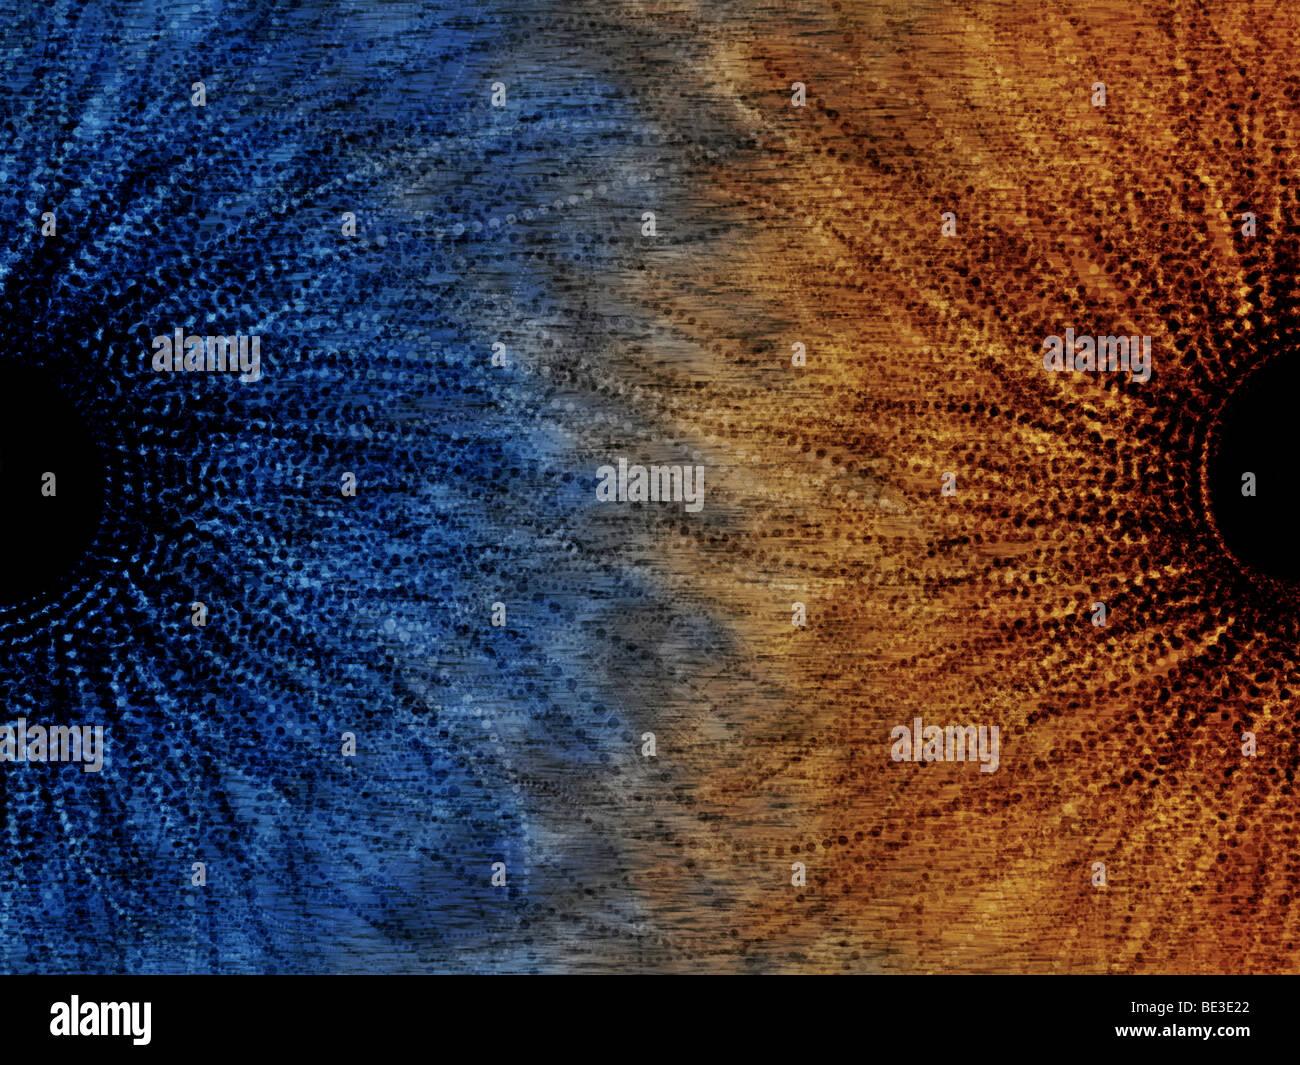 Duality motif - Stock Image